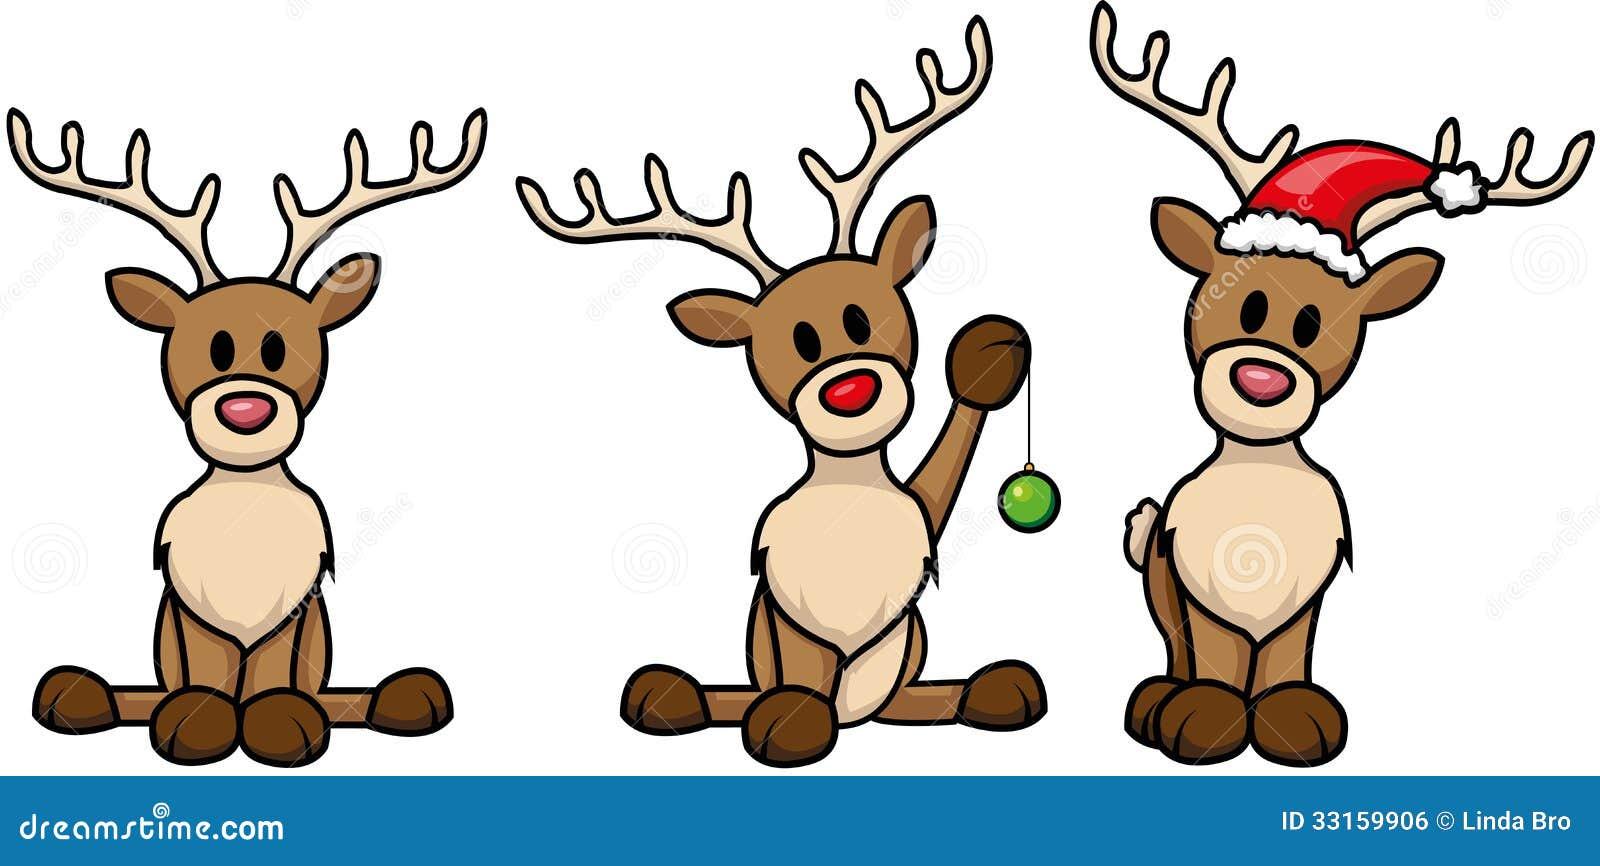 Reindeer-set Royalty Free Stock Image - Image: 33159906